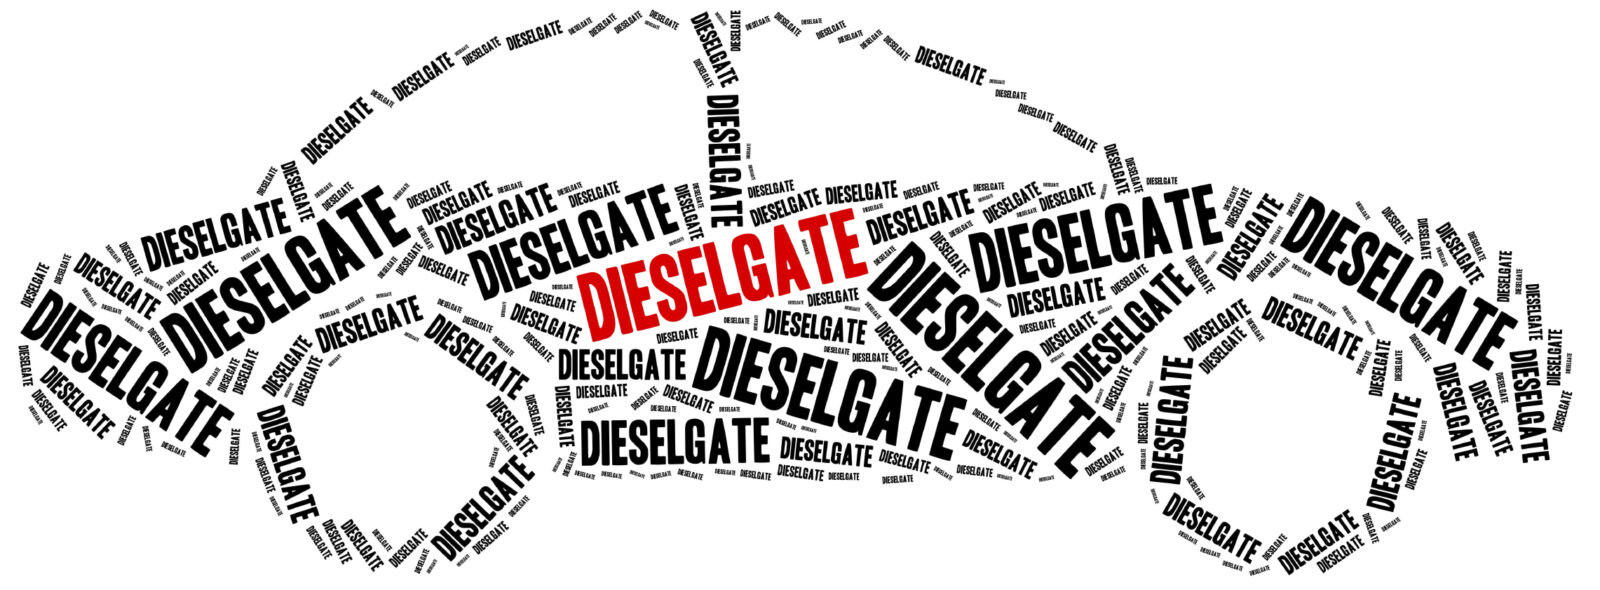 VW diesel scandal